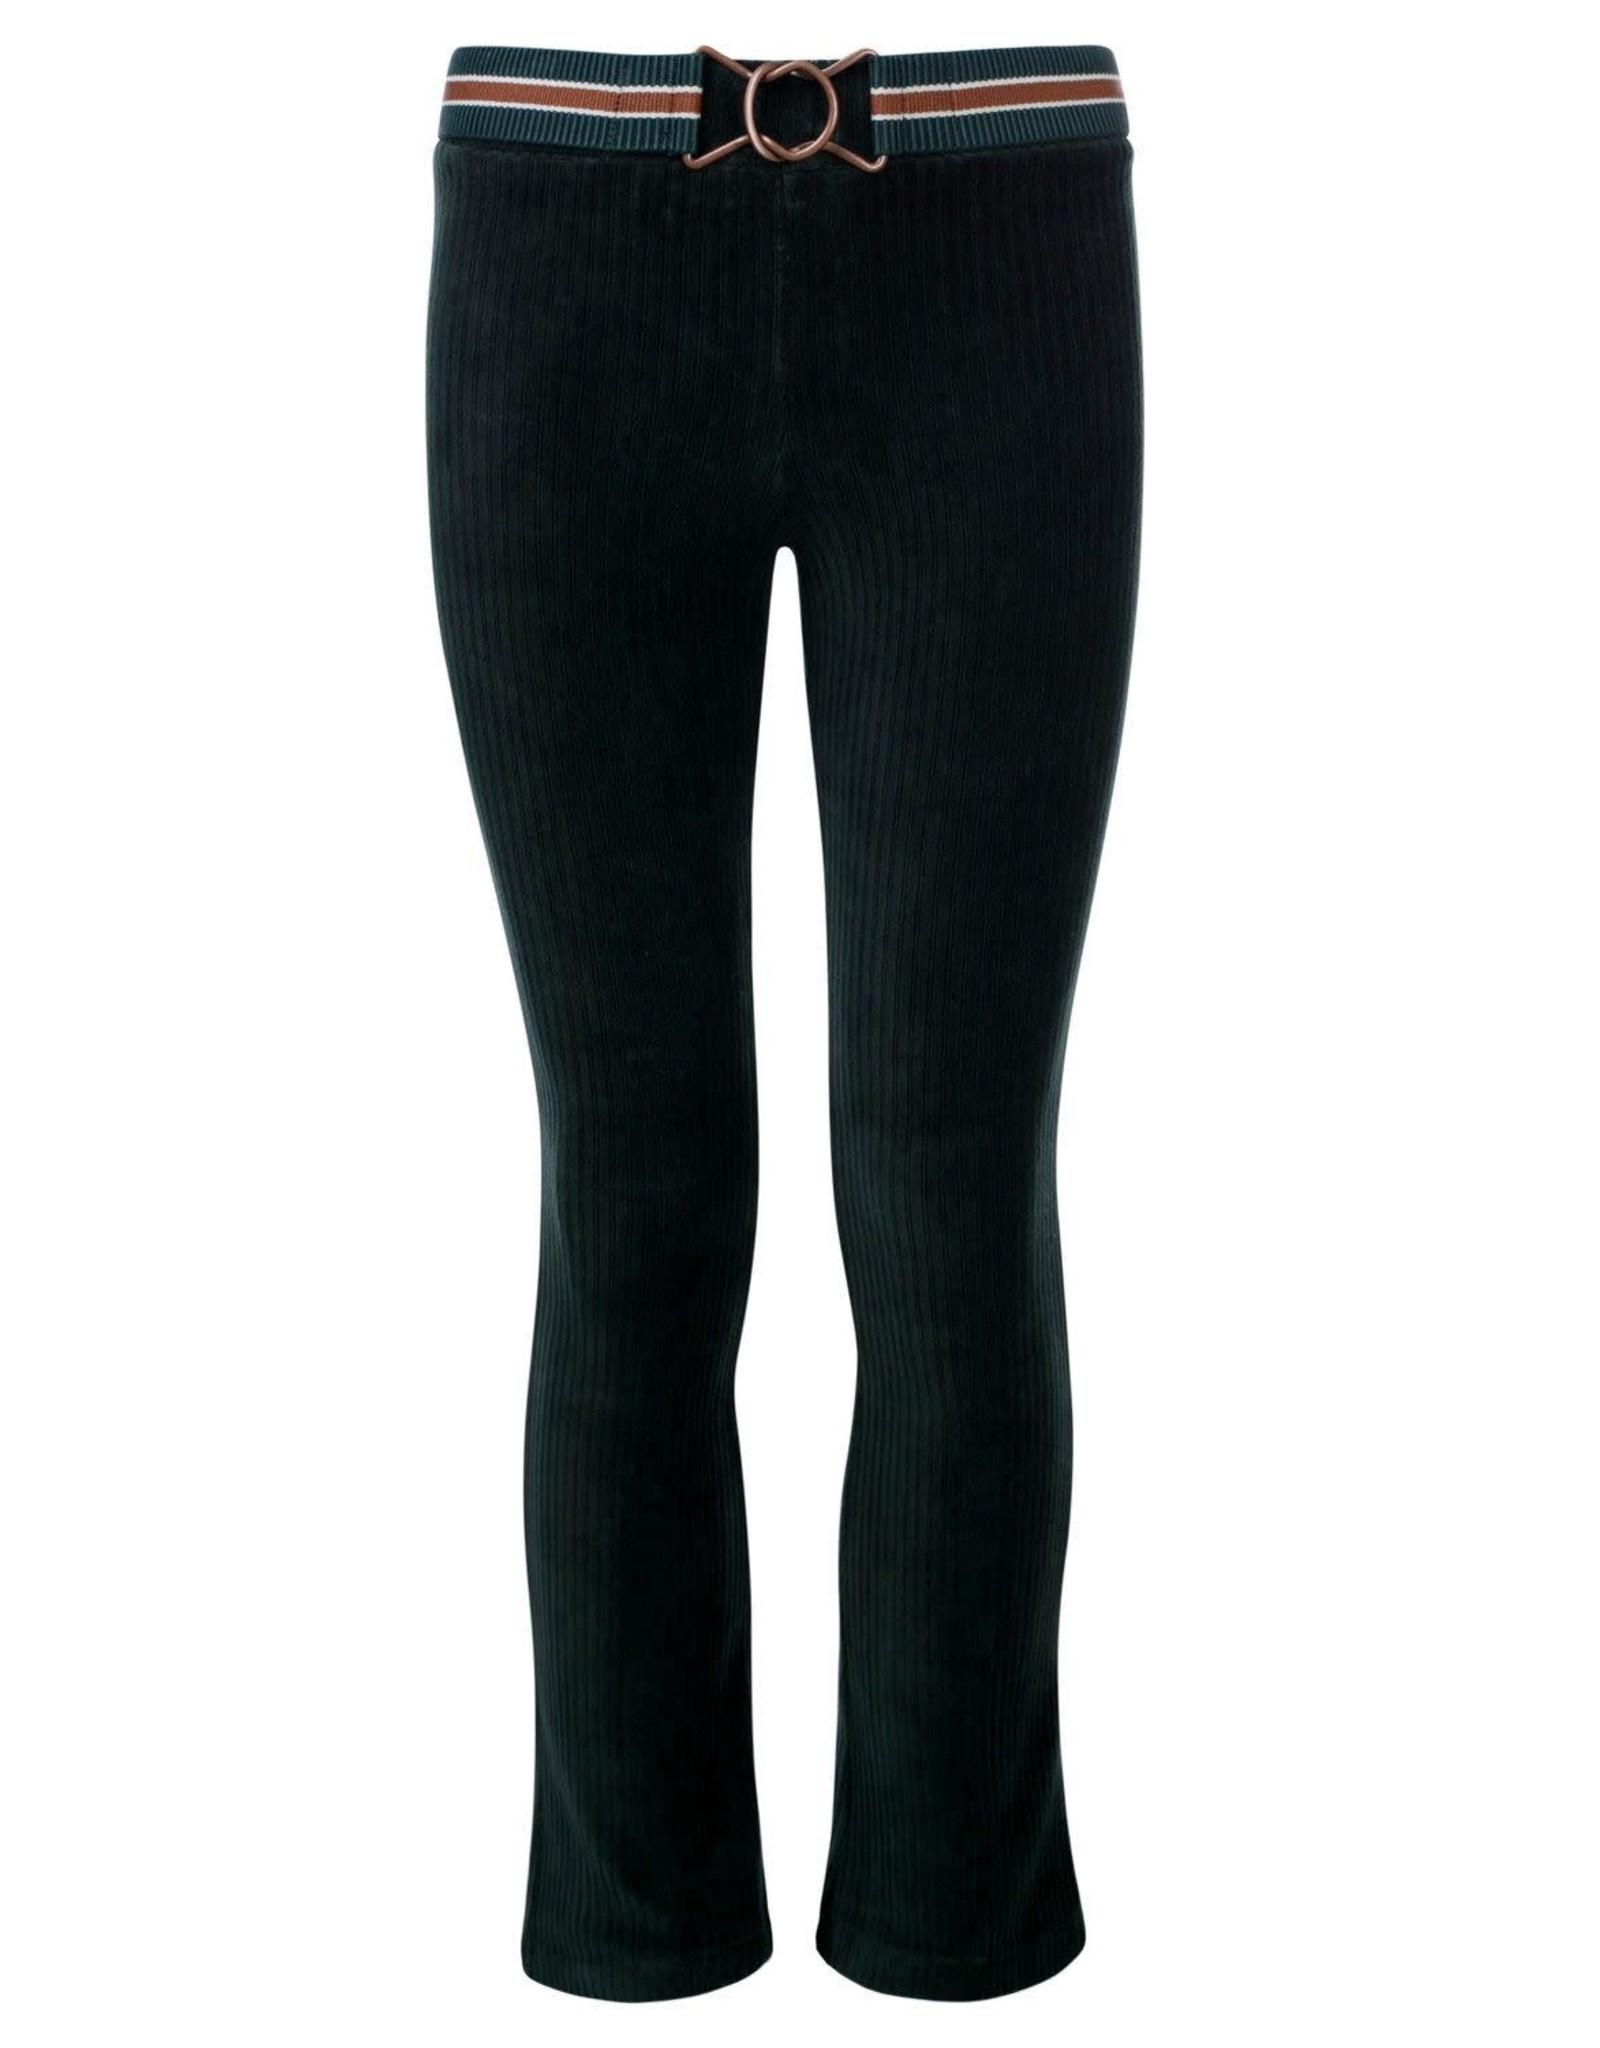 looxs 2032-5654 Flare Pants